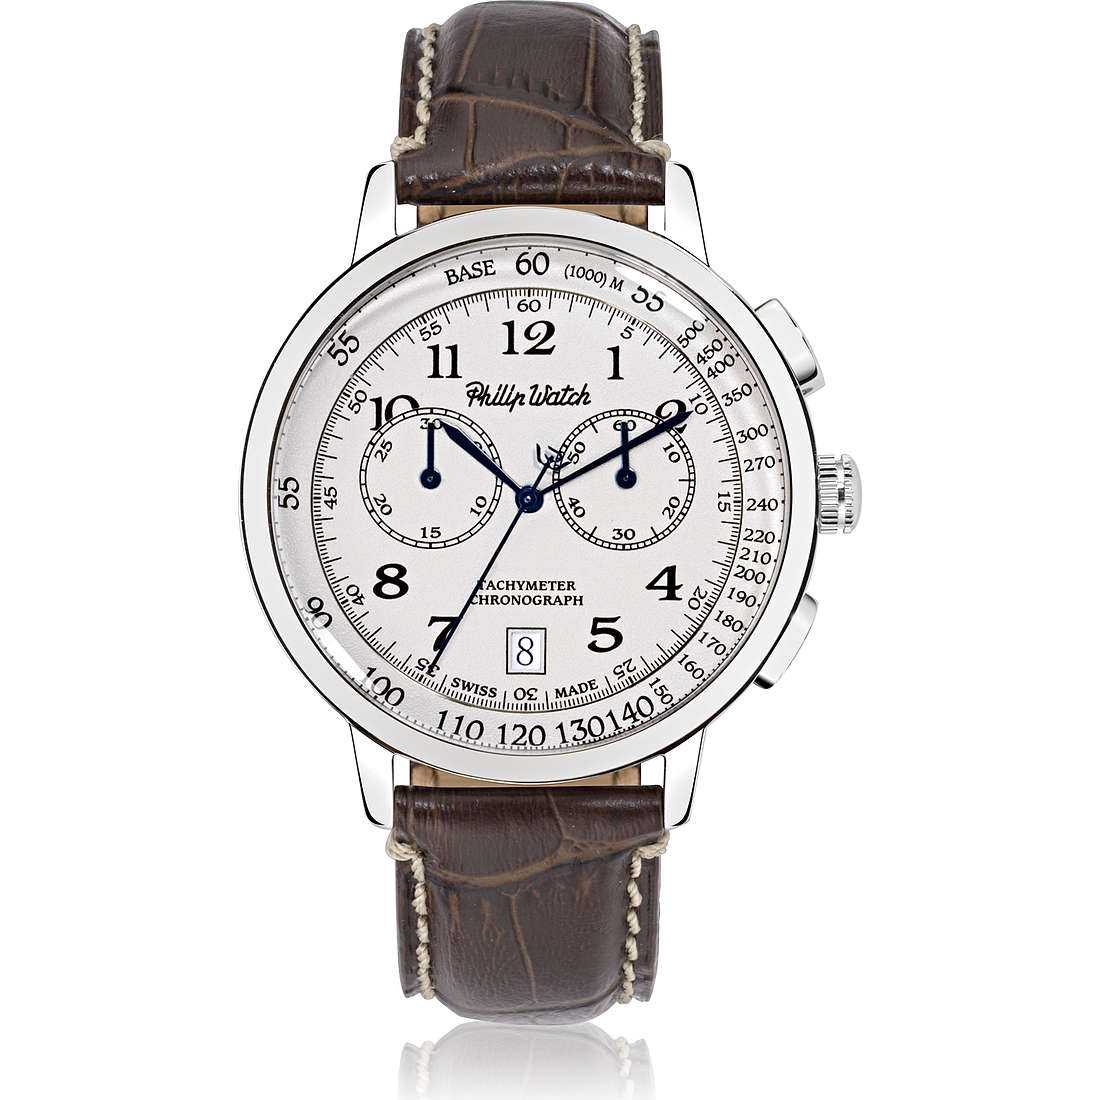 Orologio philip watch r8271698004